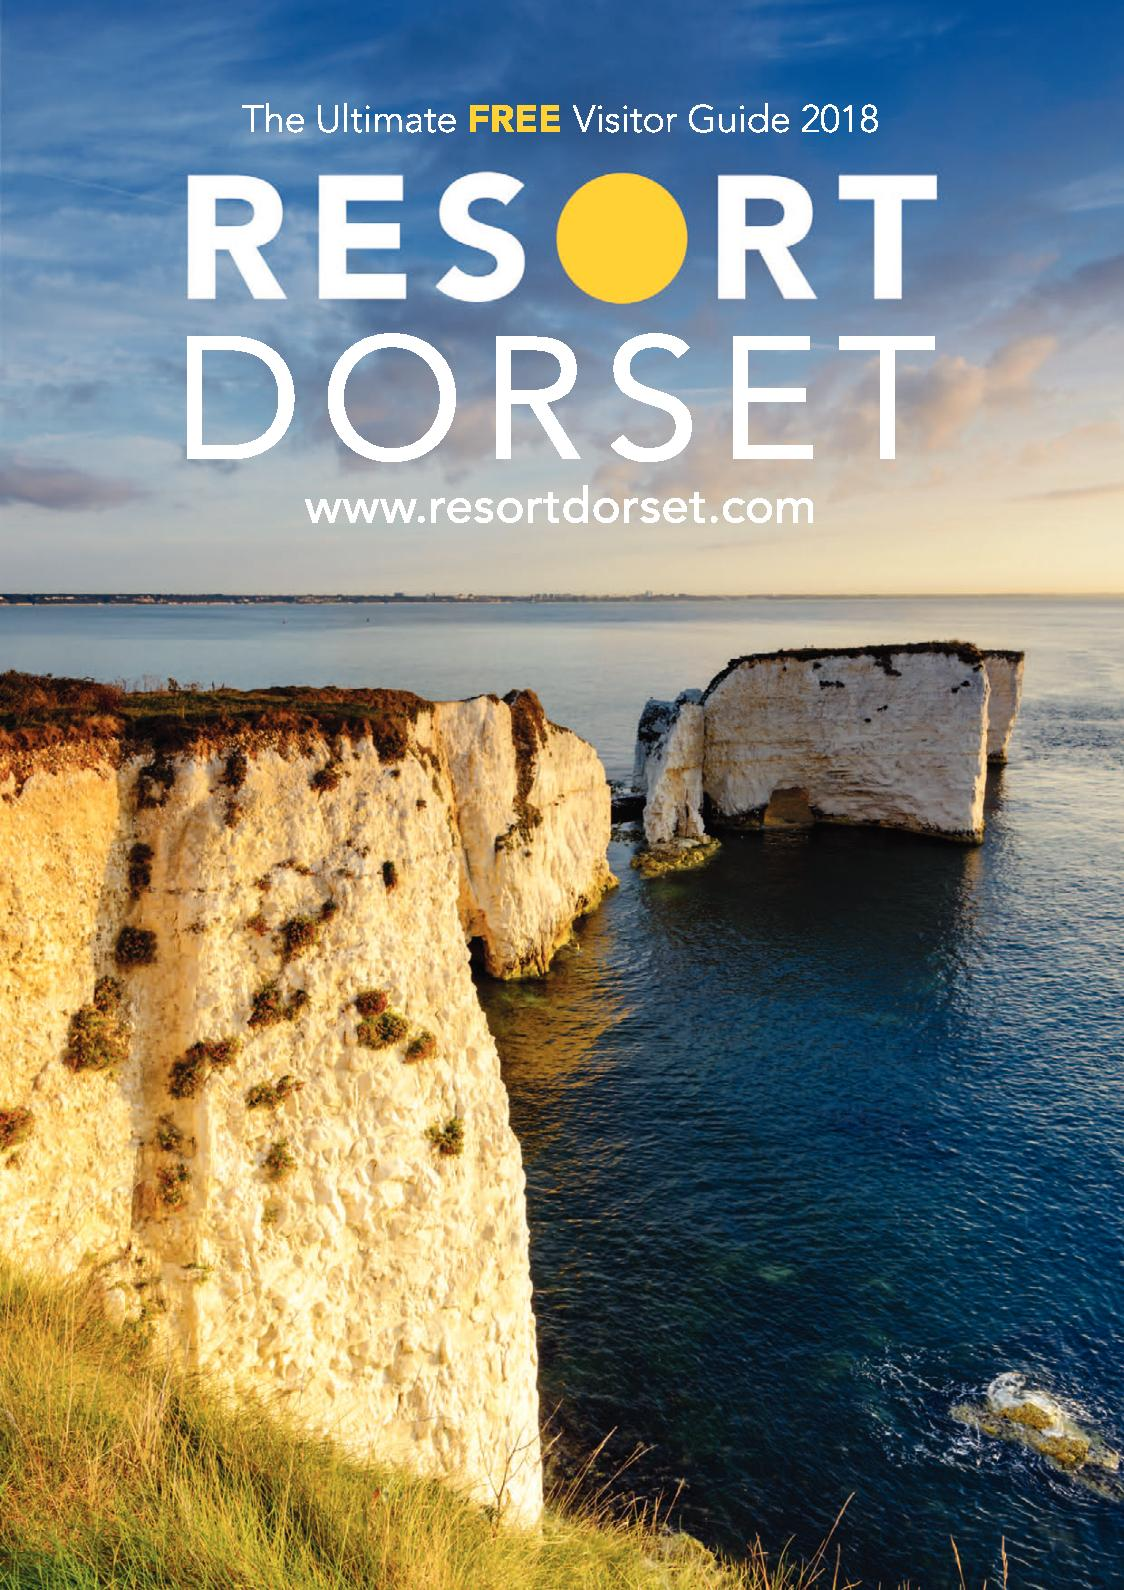 Calaméo - Resort Dorset 2018 East 3e04c722eadb